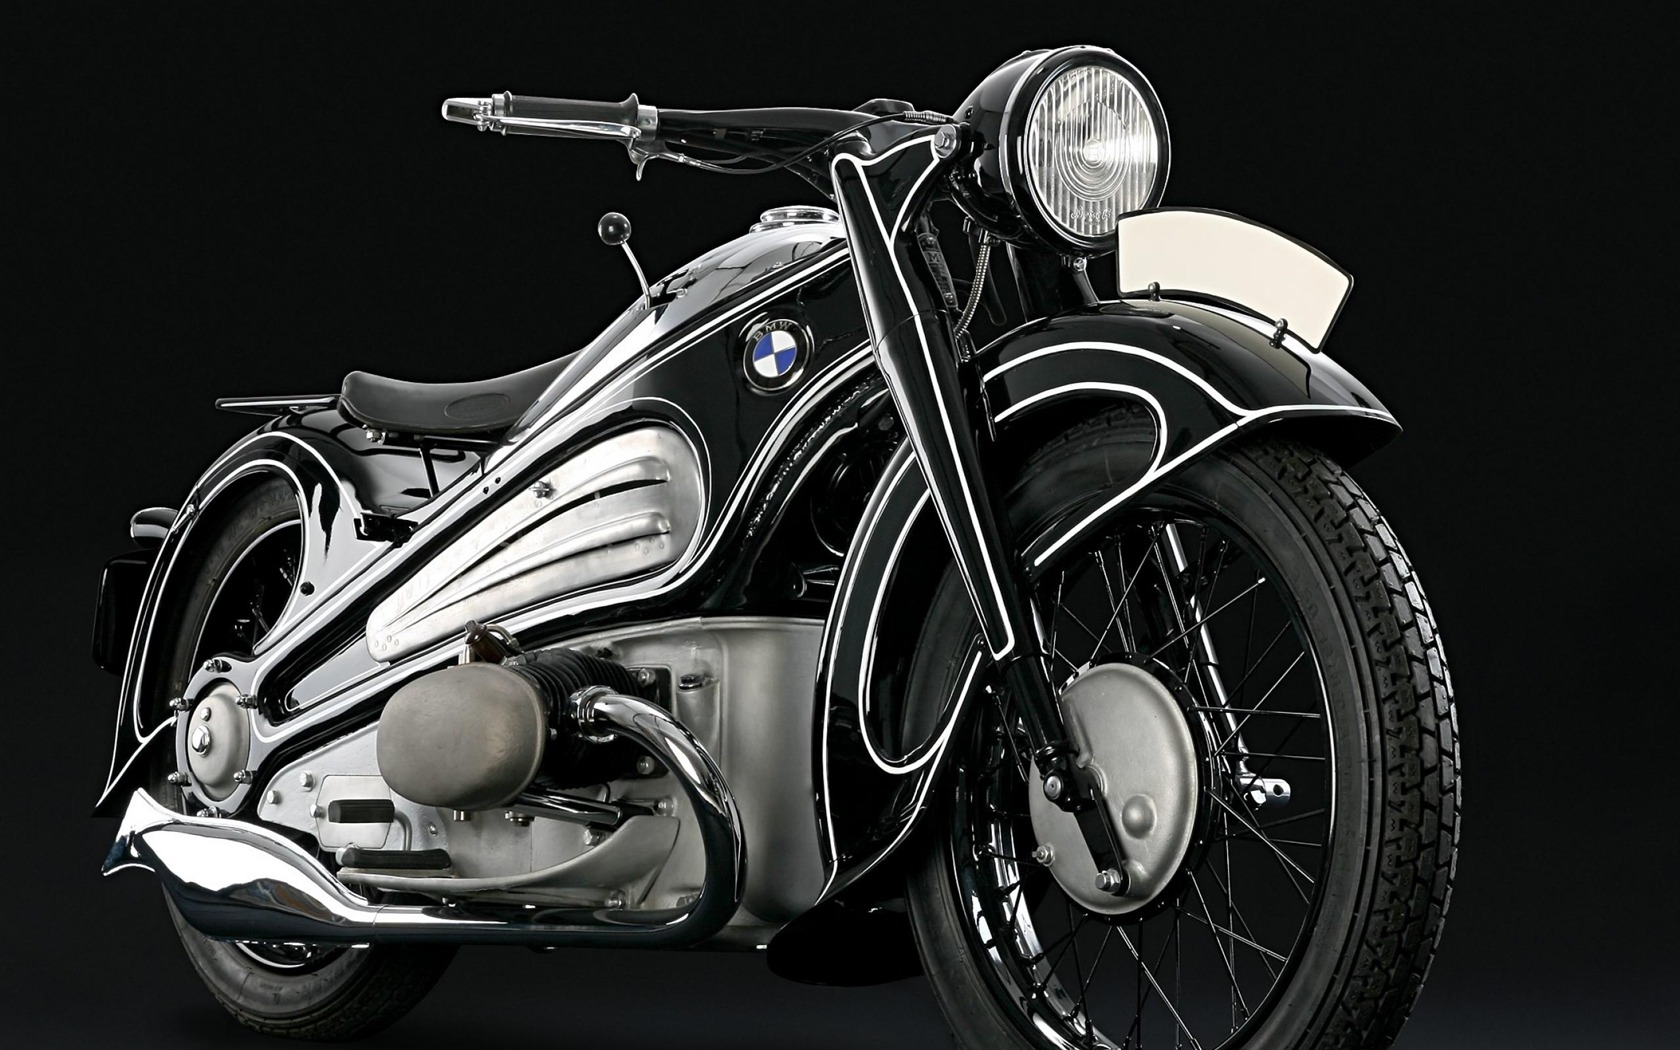 Bmwモーターサイクルスポーツバイク トップスポーツバイクの写真の壁紙プレビュー 10wallpaper Com